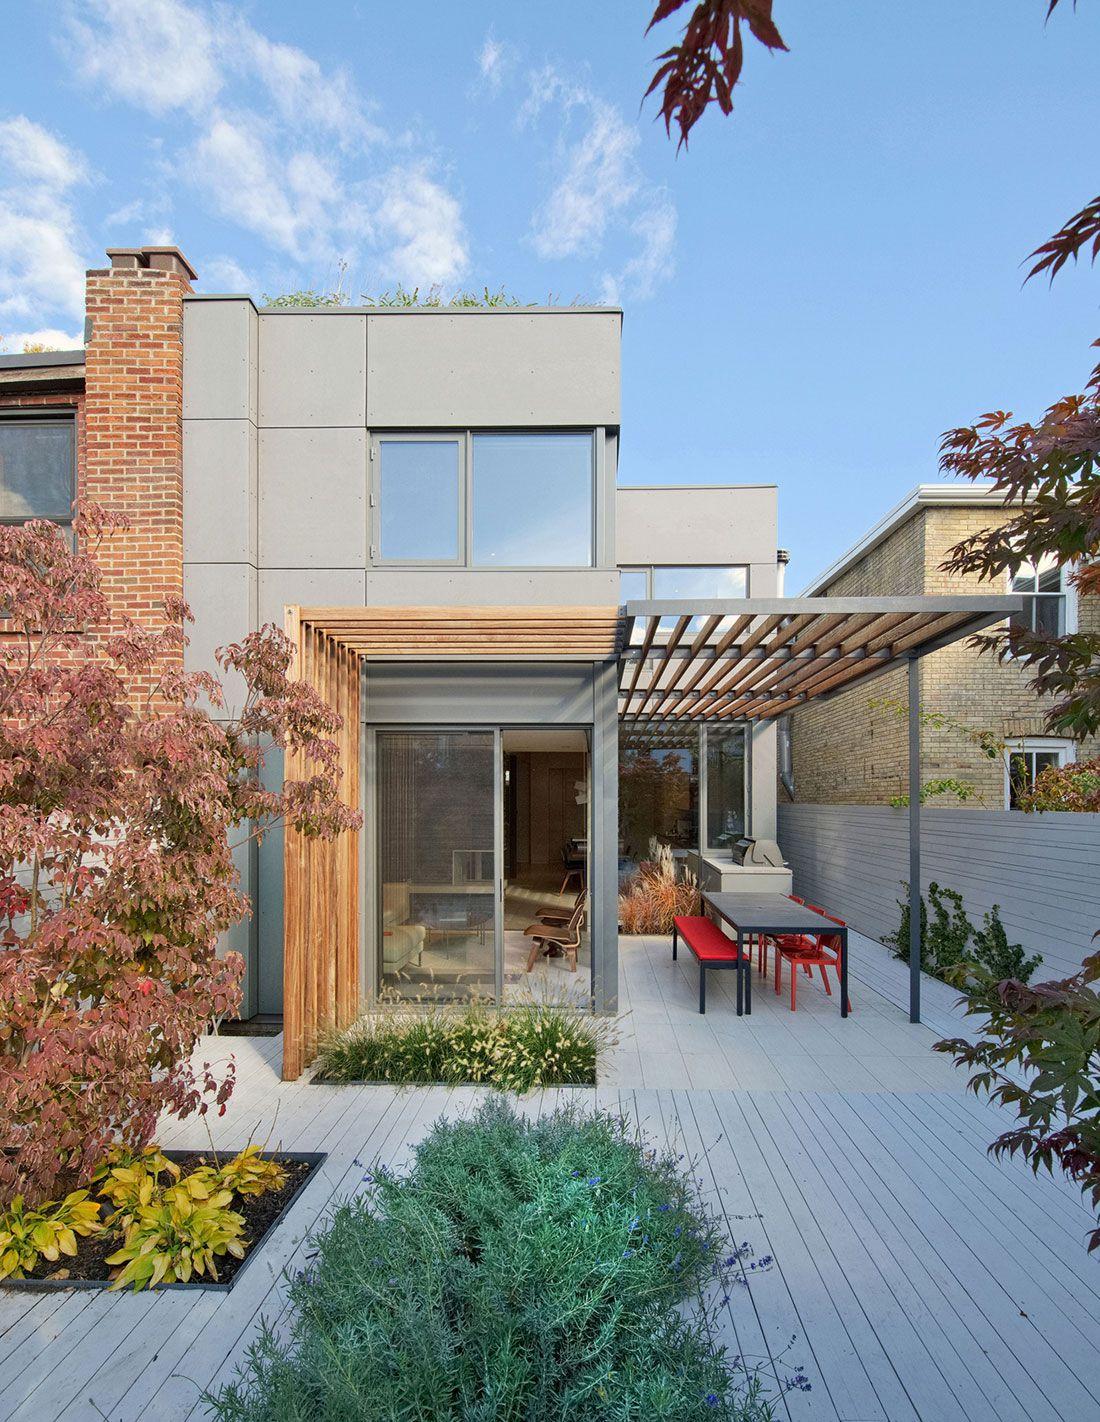 Planos de casa de dos pisos sencilla construye hogar for Diseno de casa sencilla